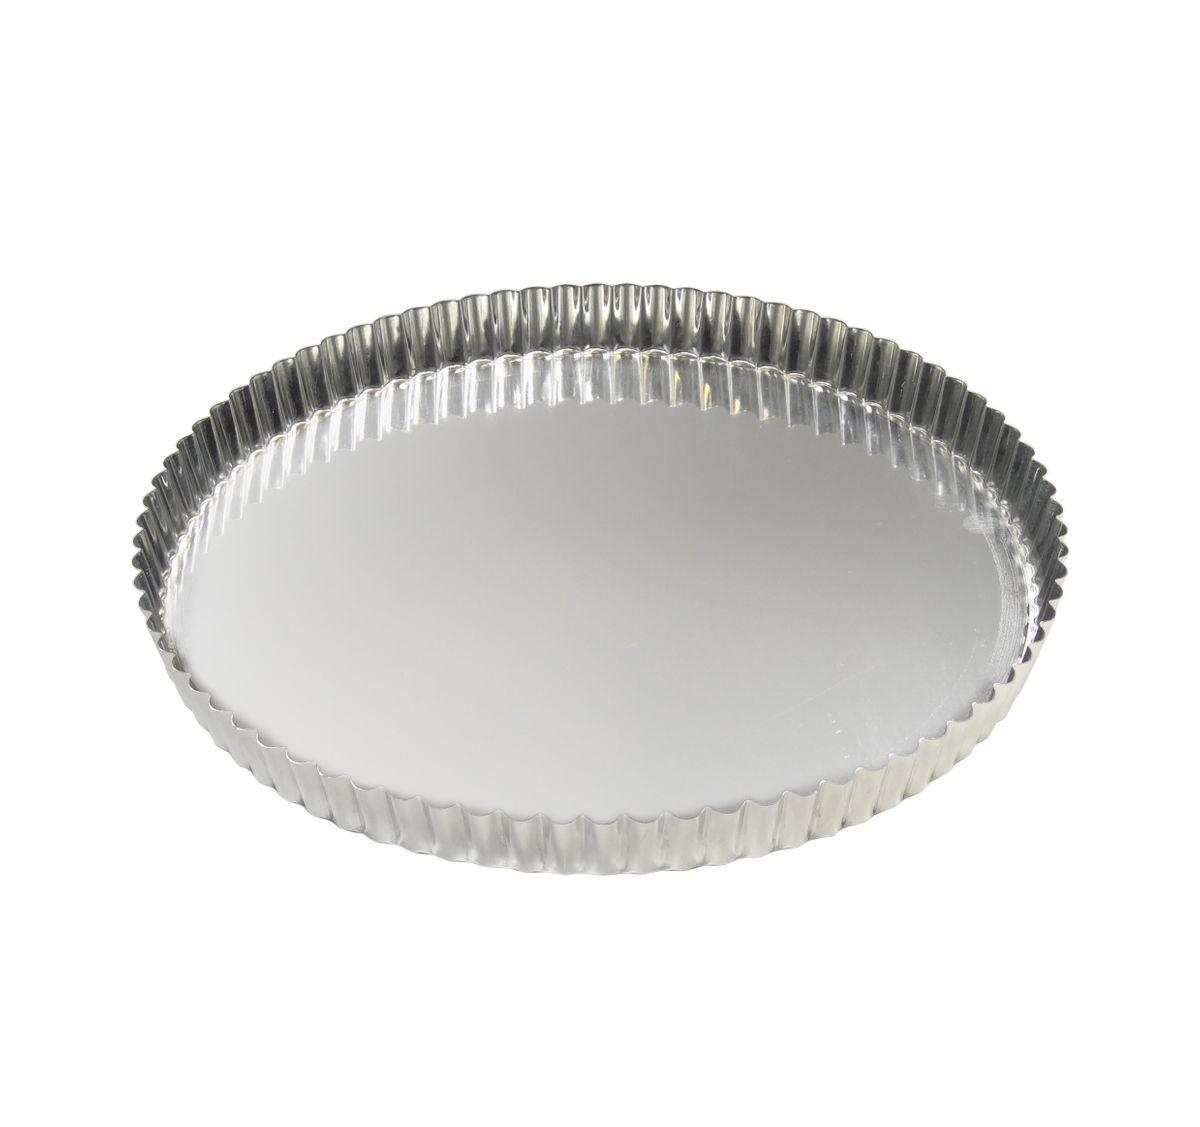 Moule à tarte fer blanc 28cm - Gobel